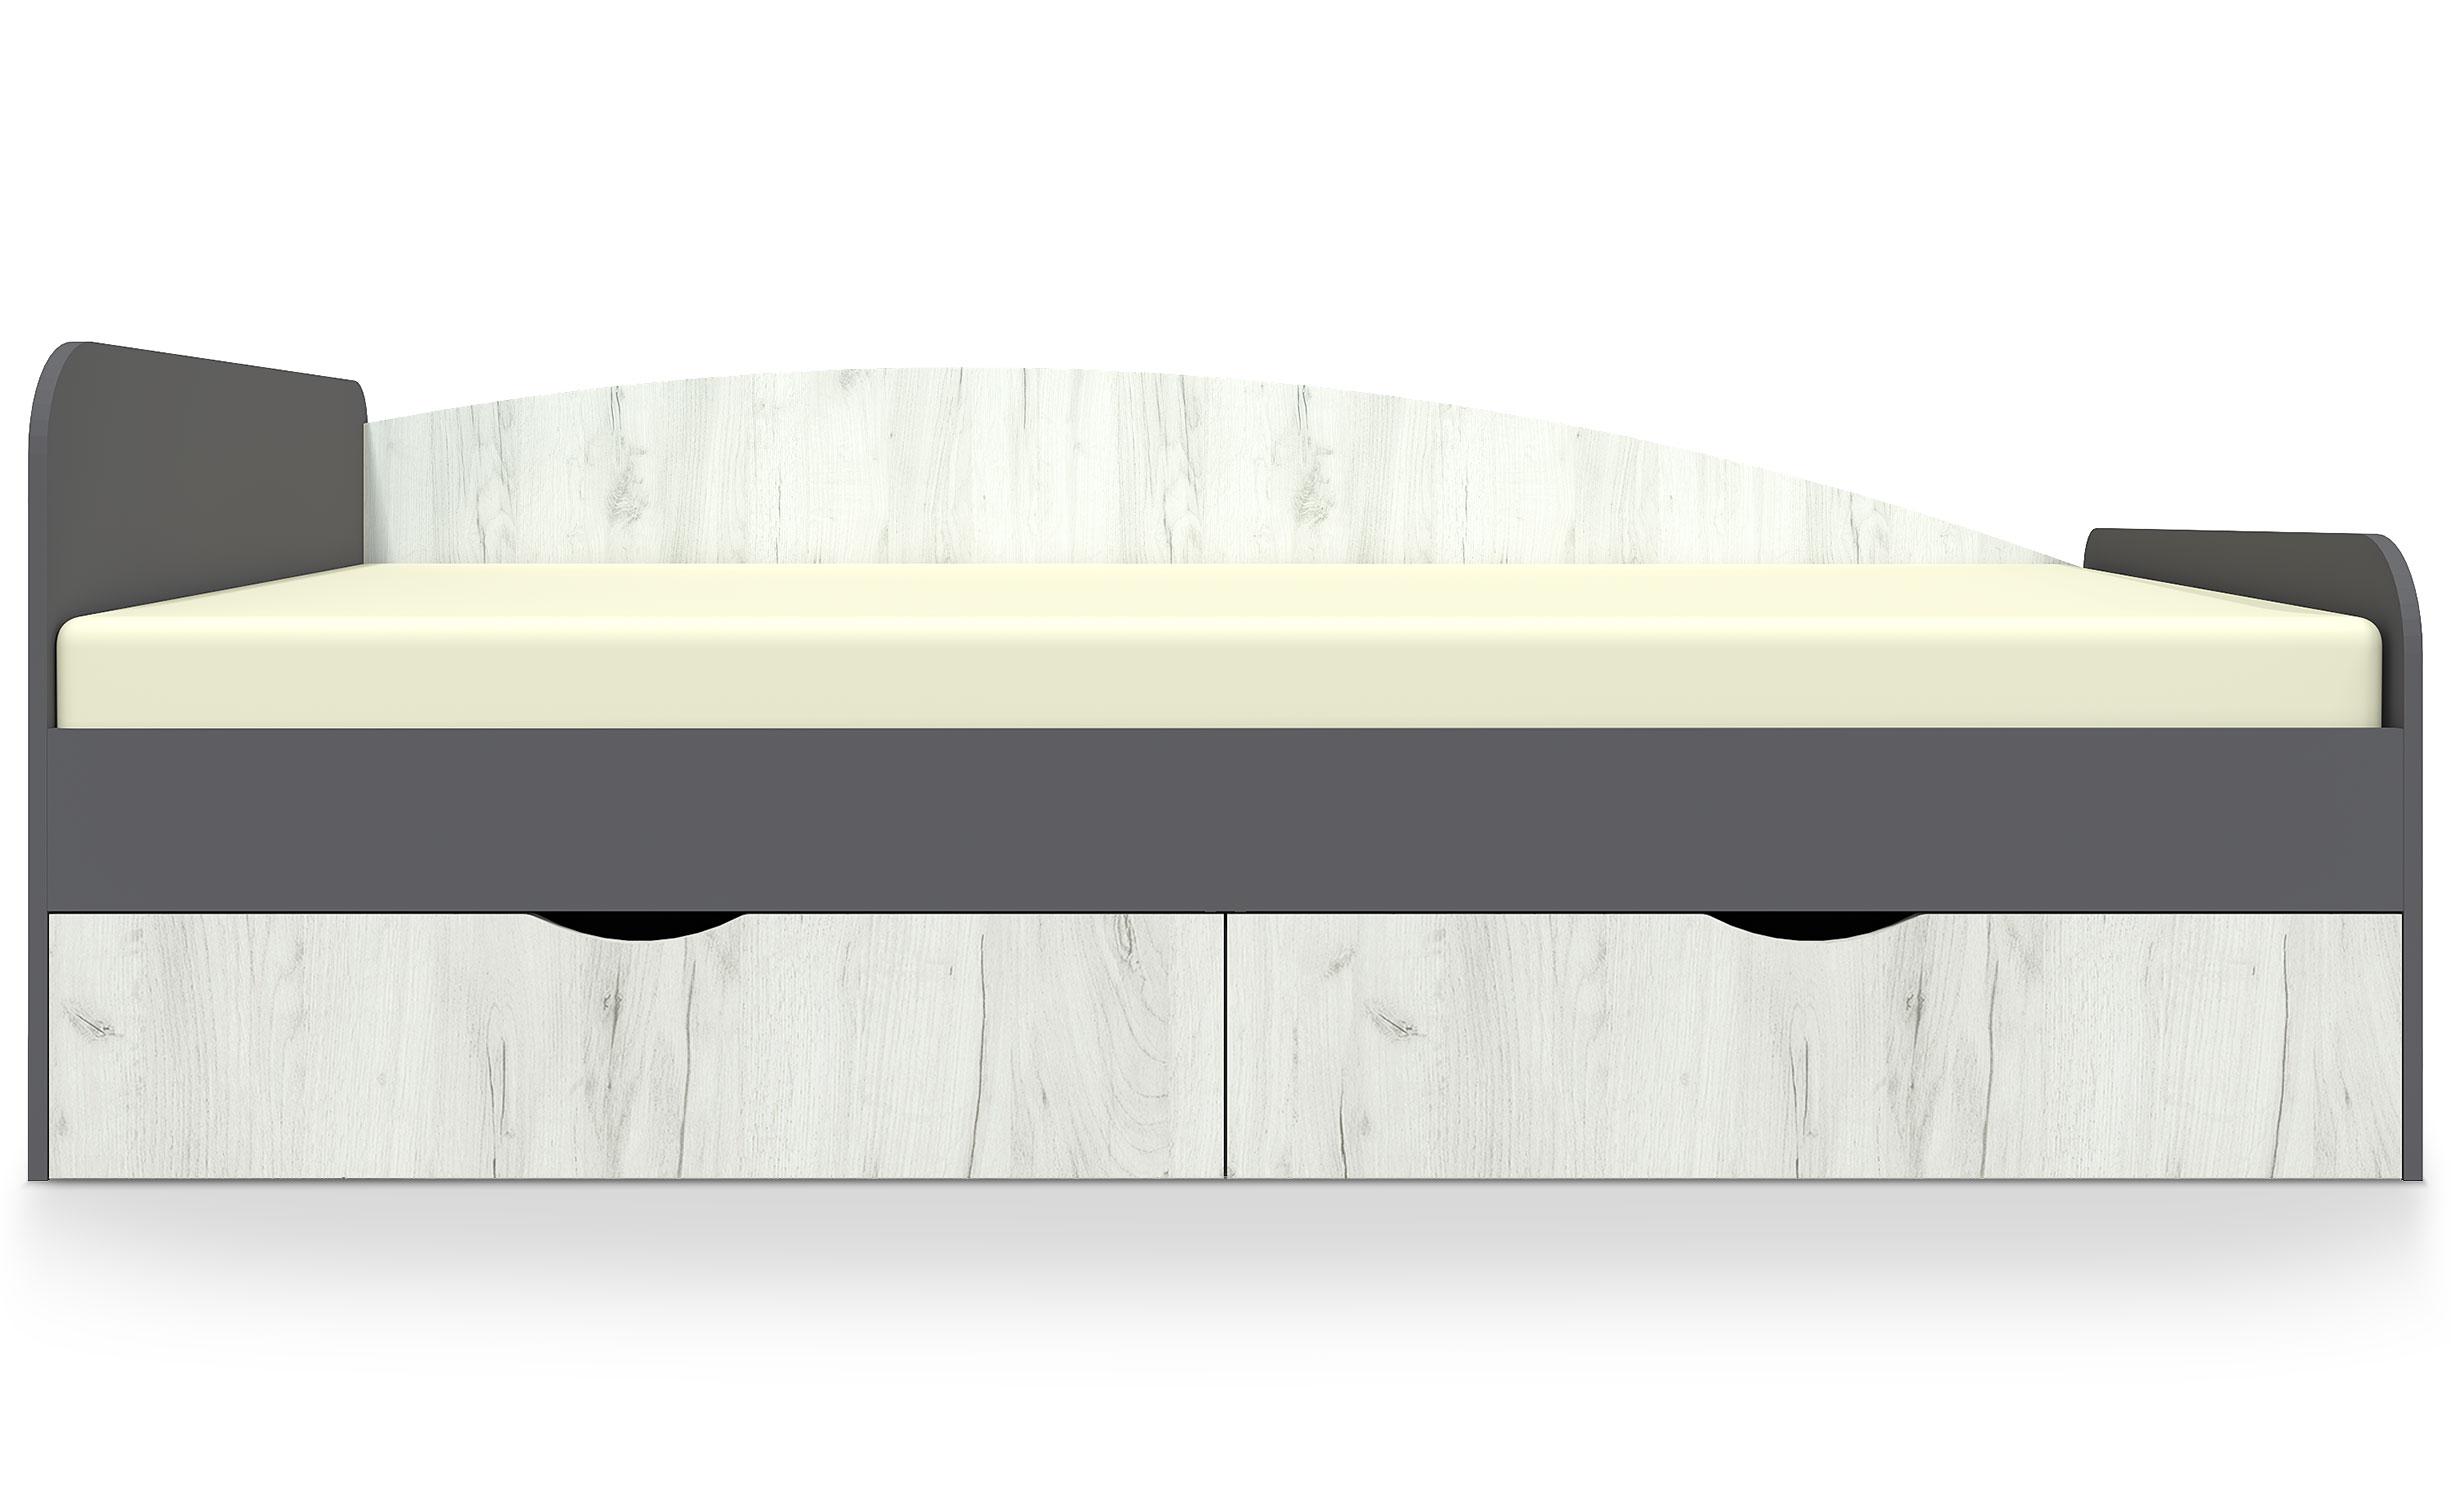 Caradec Kinderbett 90x200cm Grau und helles Holz